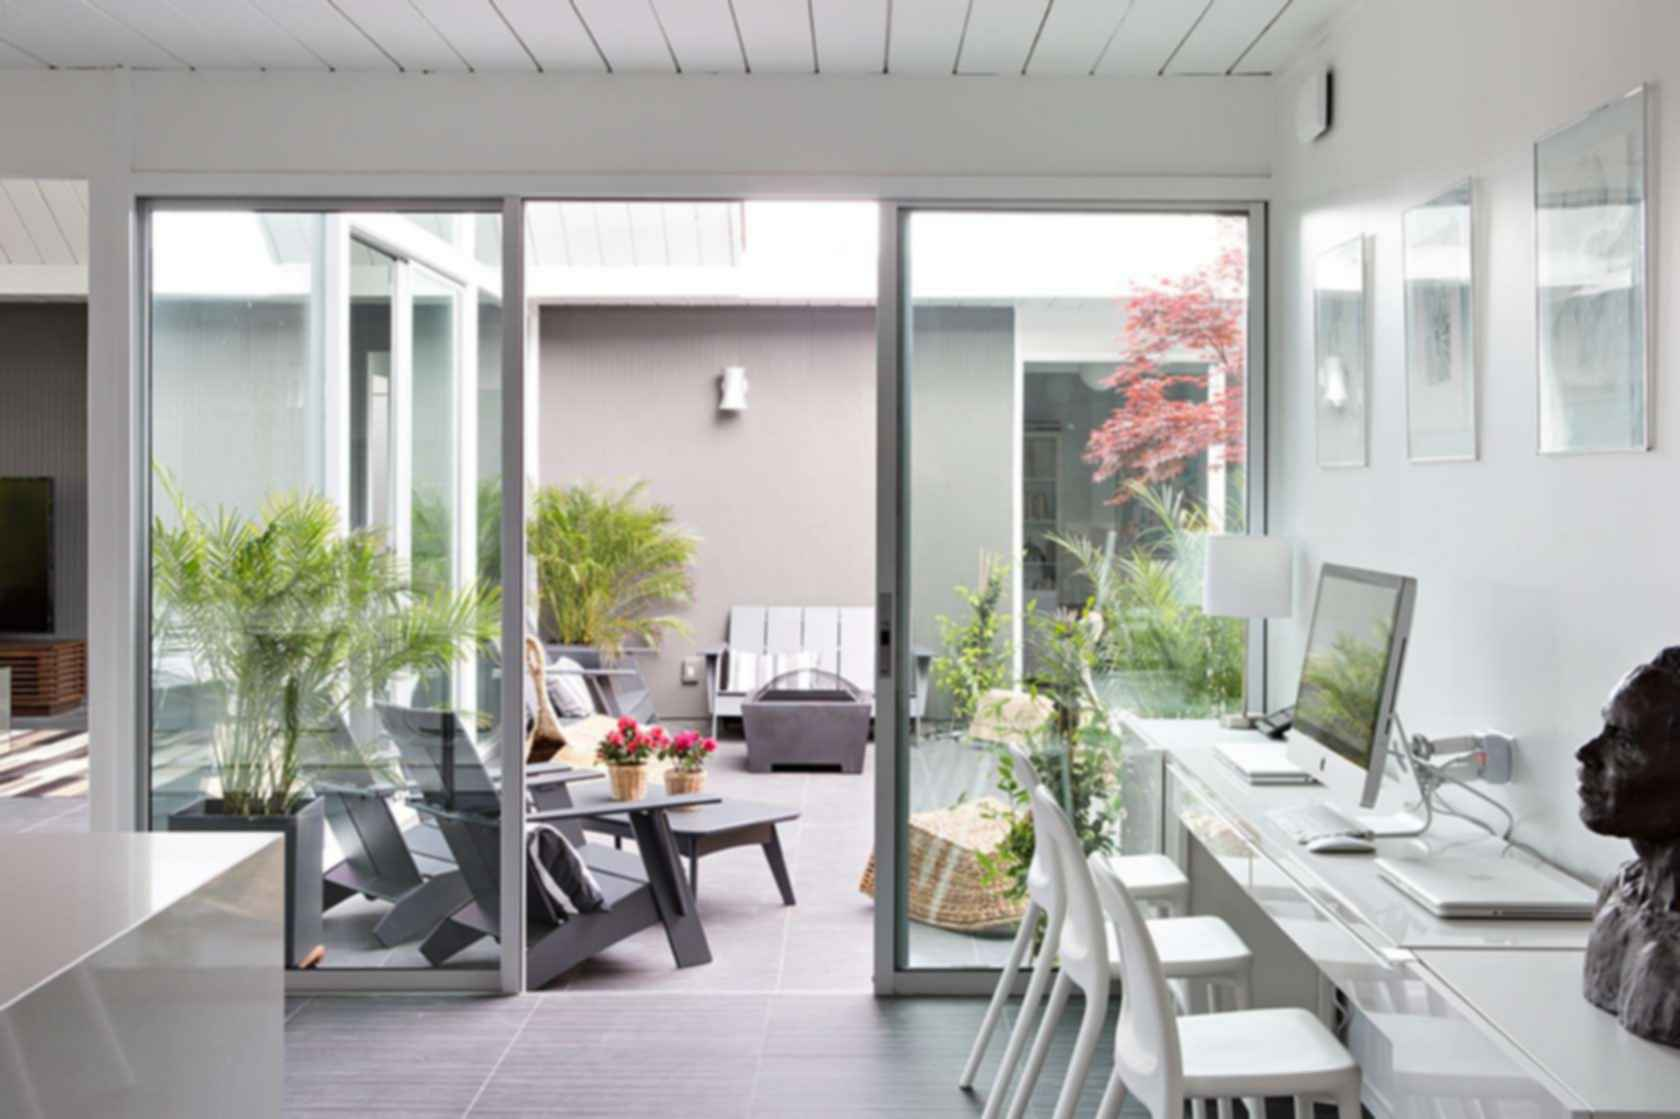 Double Gable Eichler Remodel - Interior/Exterior